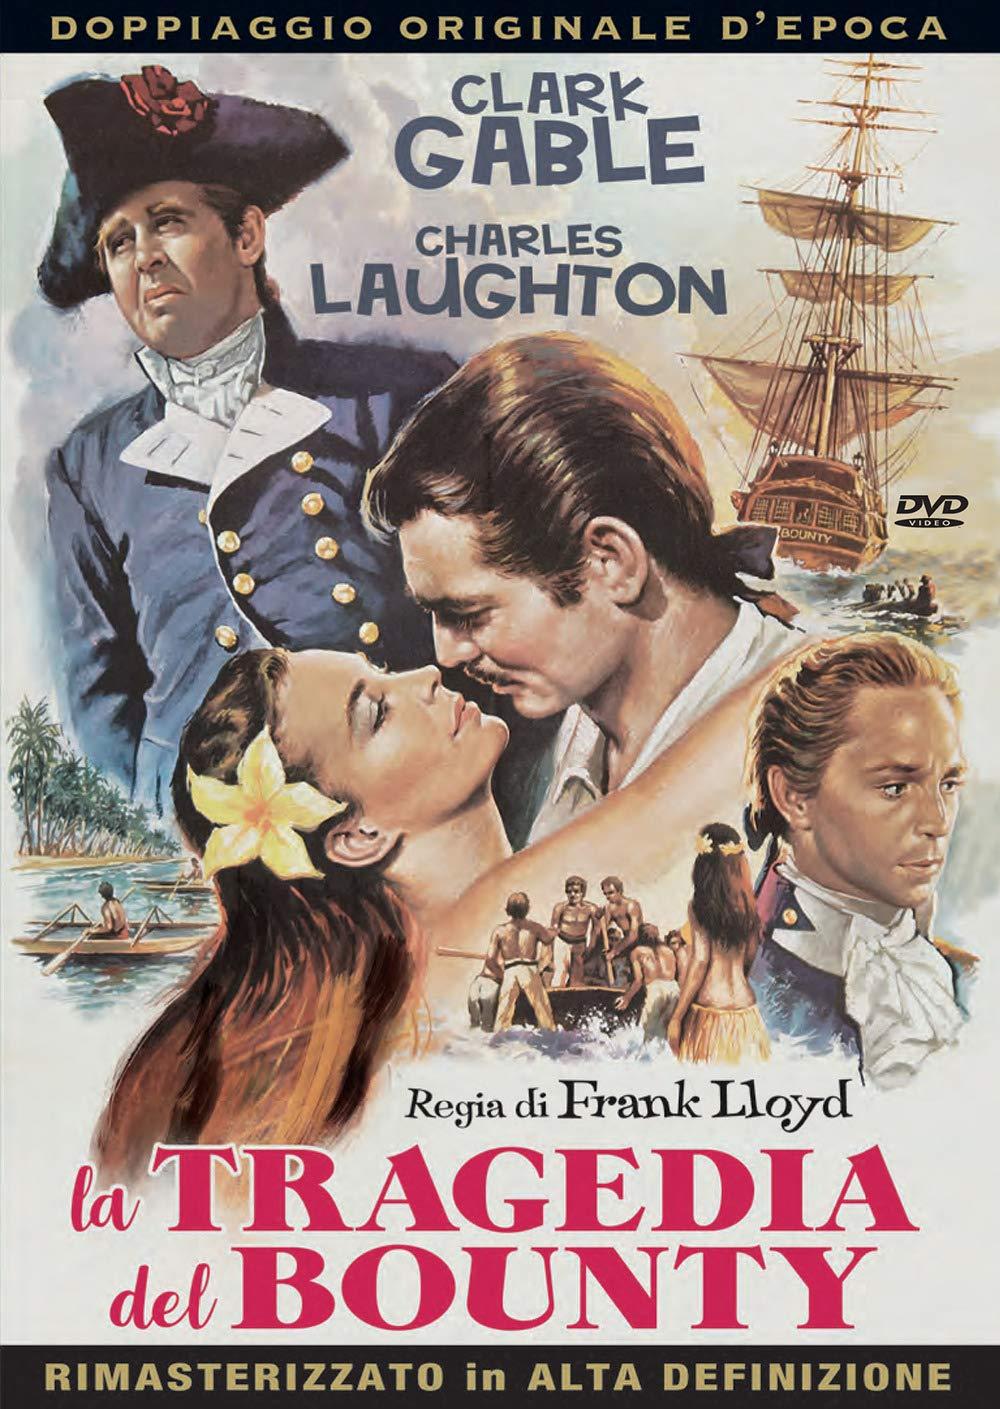 LA TRAGEDIA DEL BOUNTY (DVD)